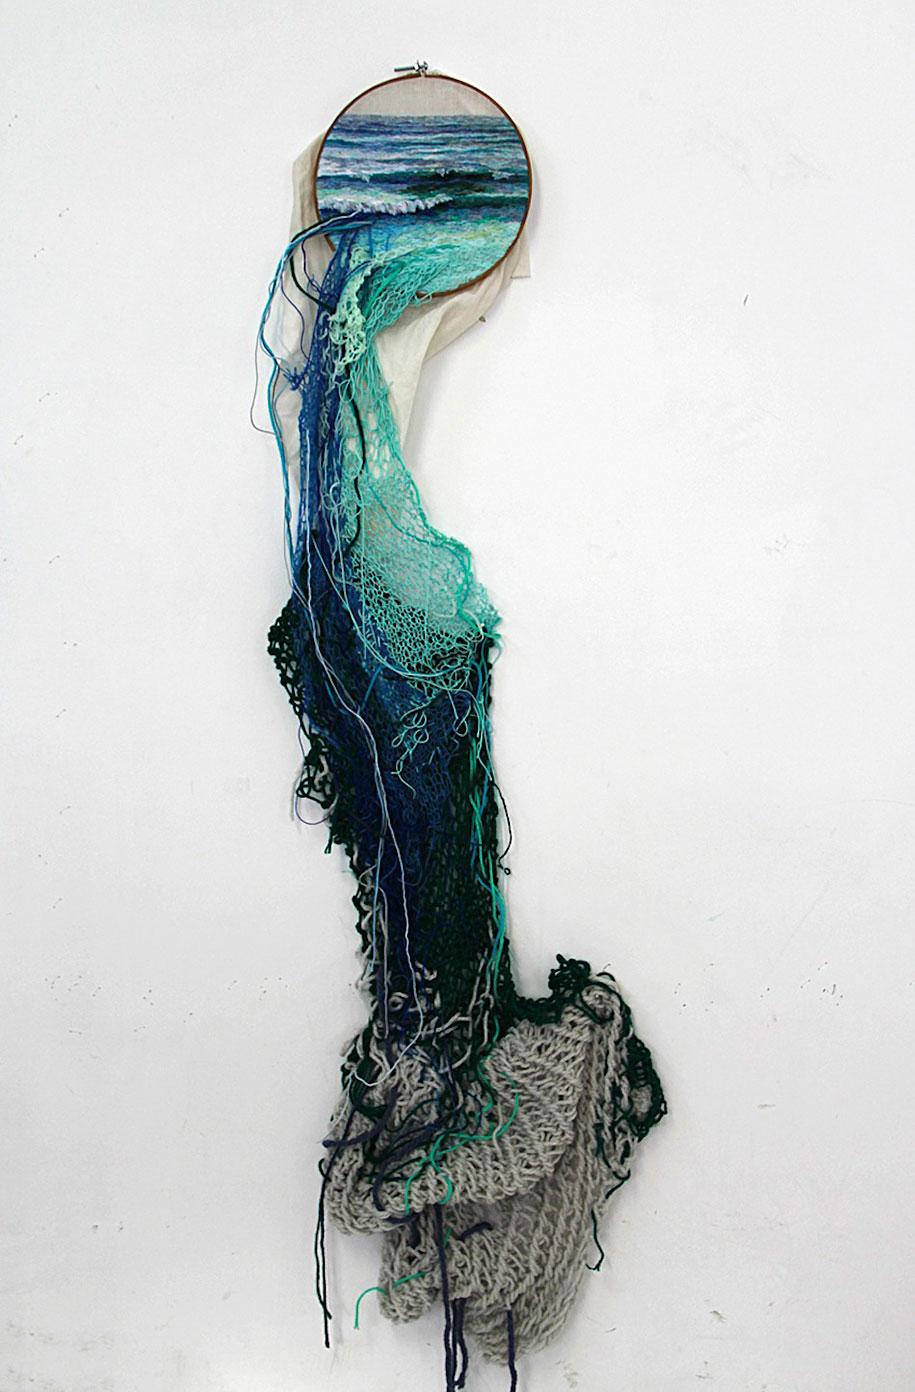 embroidered-landscapes-art-ana-teresa-barboza-4